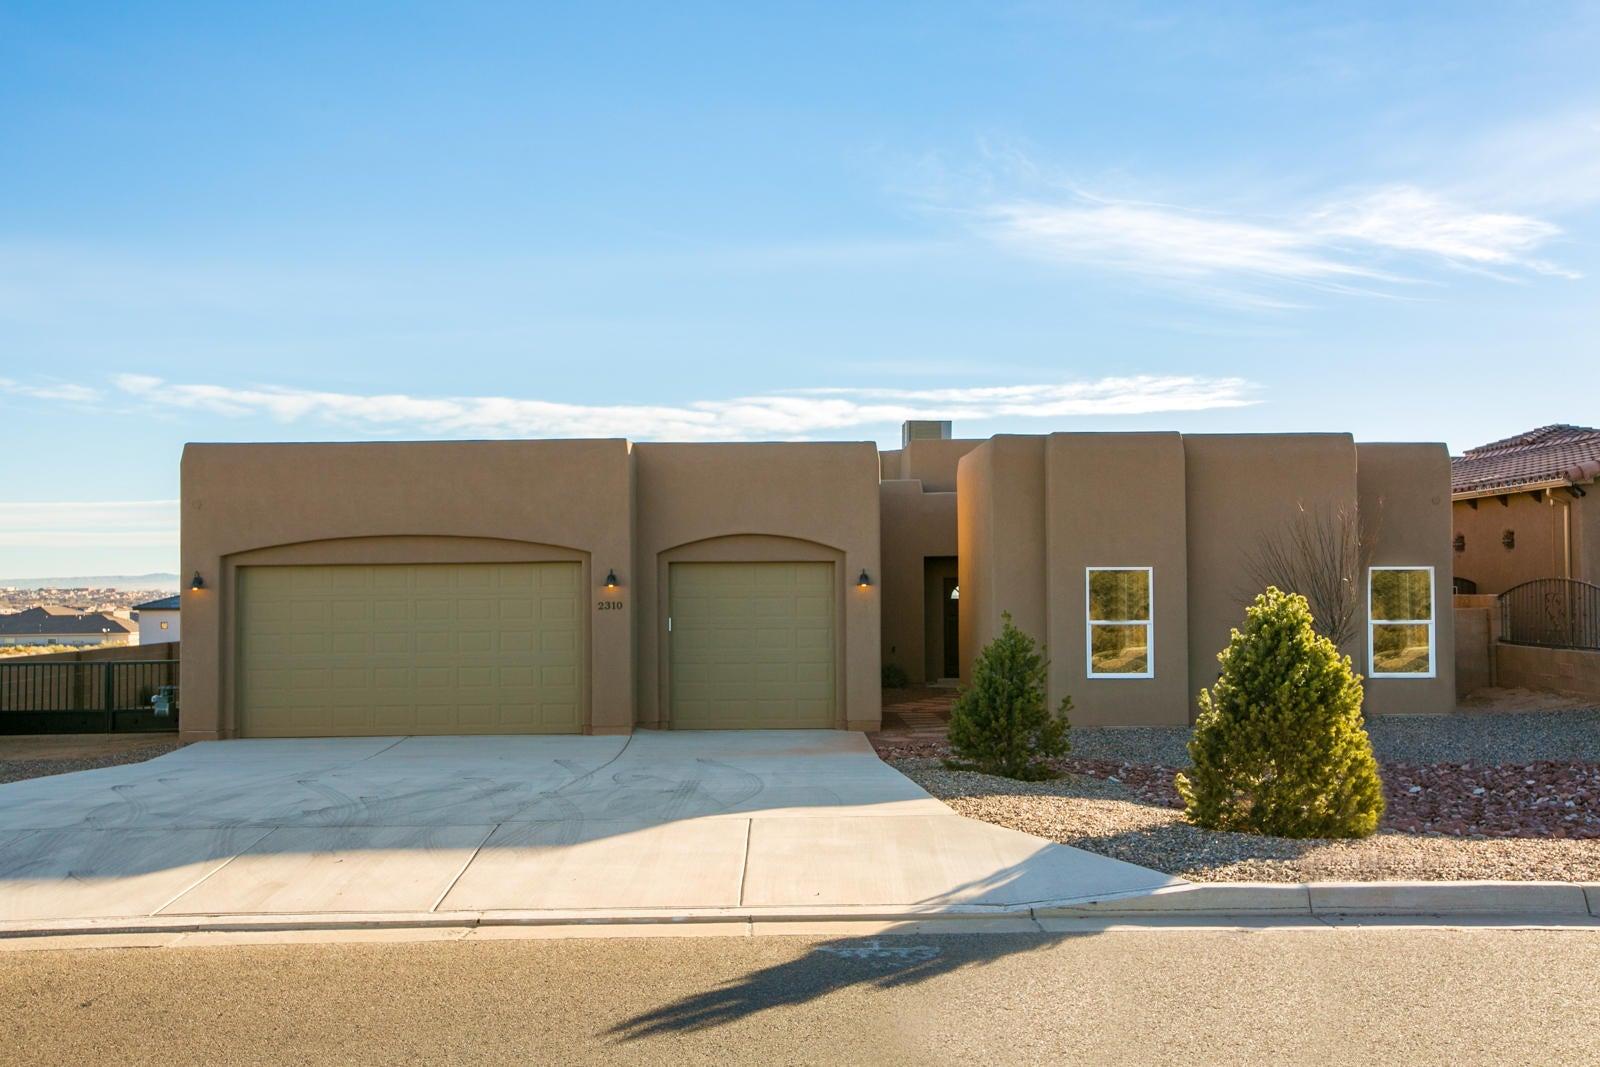 2310  15Th Street, Rio Rancho, New Mexico